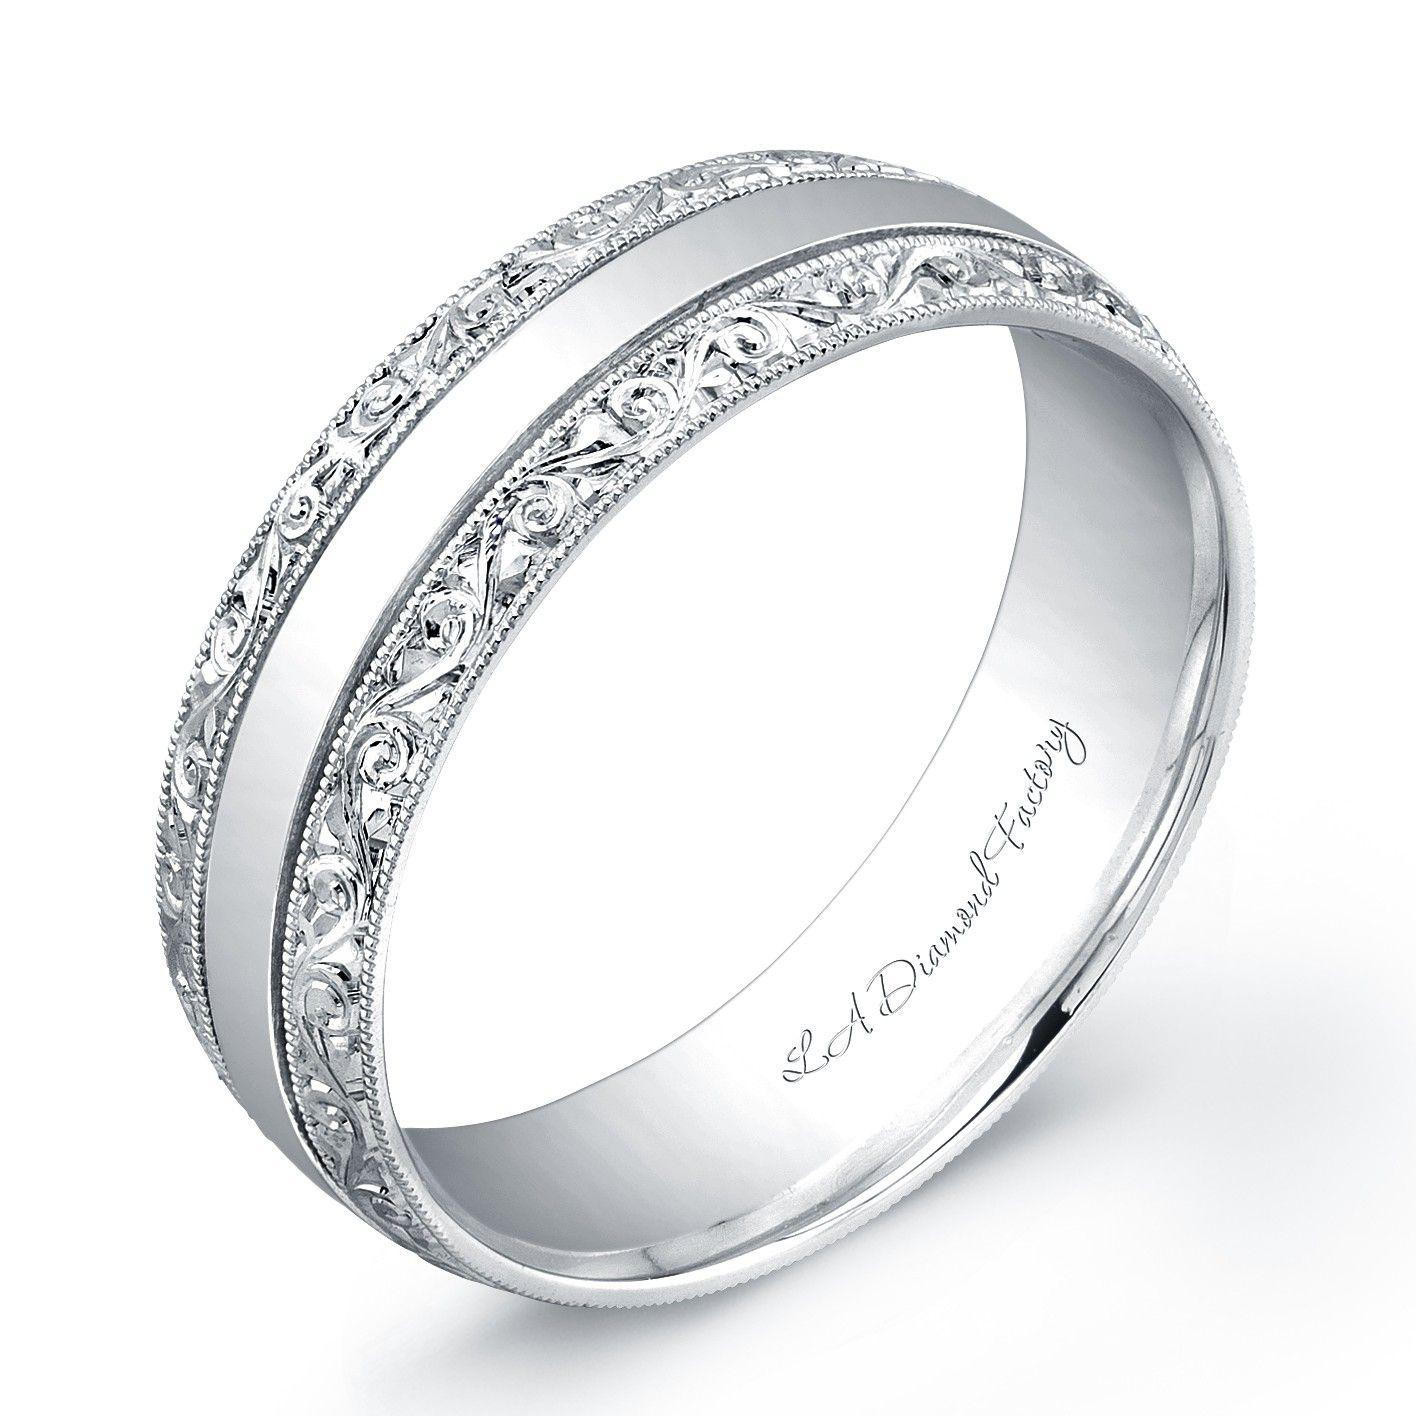 La Diamond Factory Engraved Men S Wedding Band Mens Wedding Bands Gold Wedding Band White Gold Wedding Bands